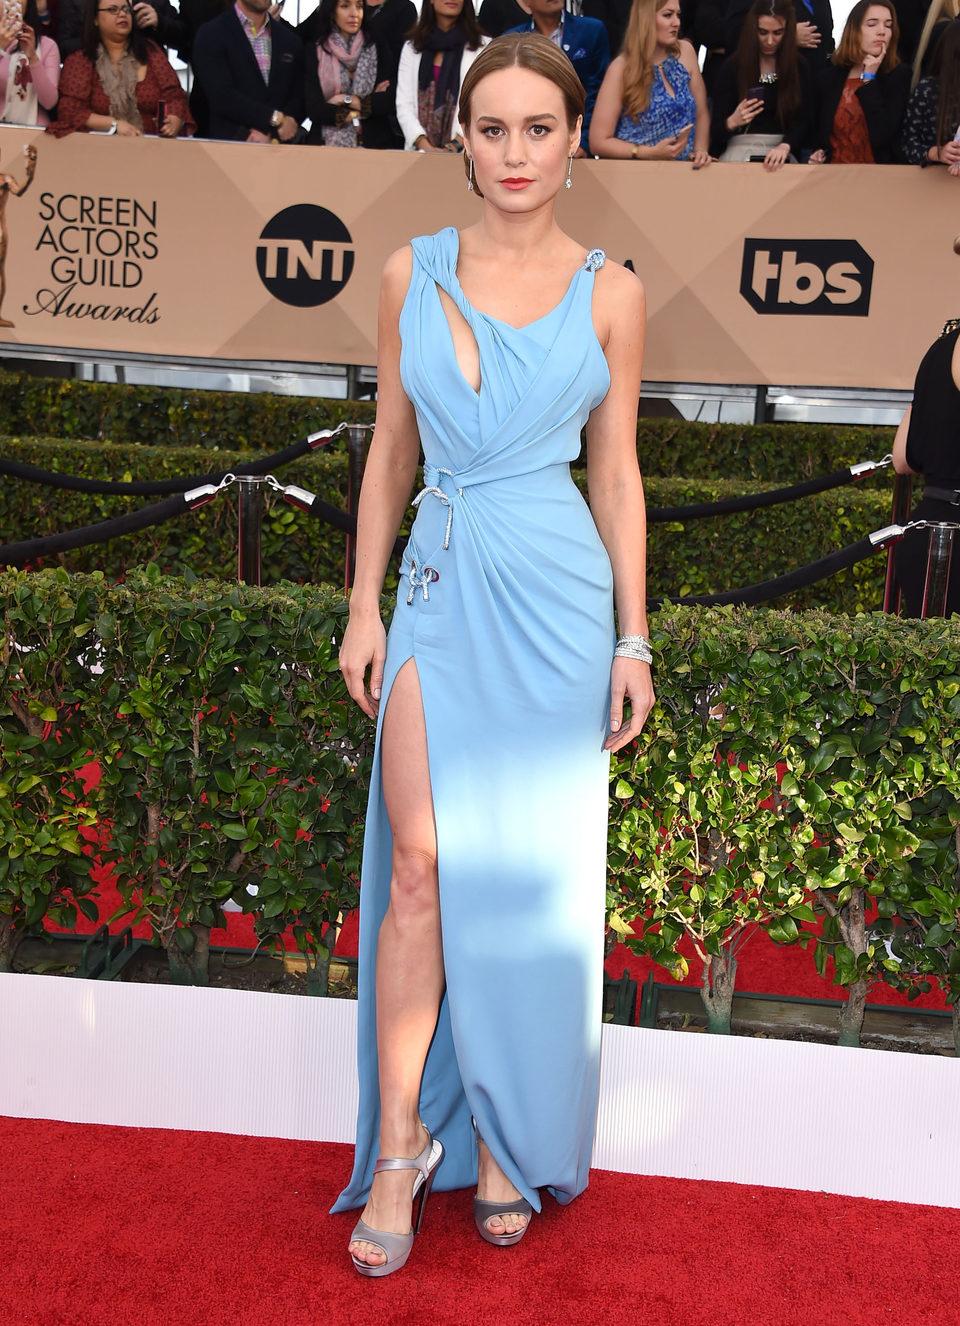 Brie Larson at the SAG Awards 2016 red carpet